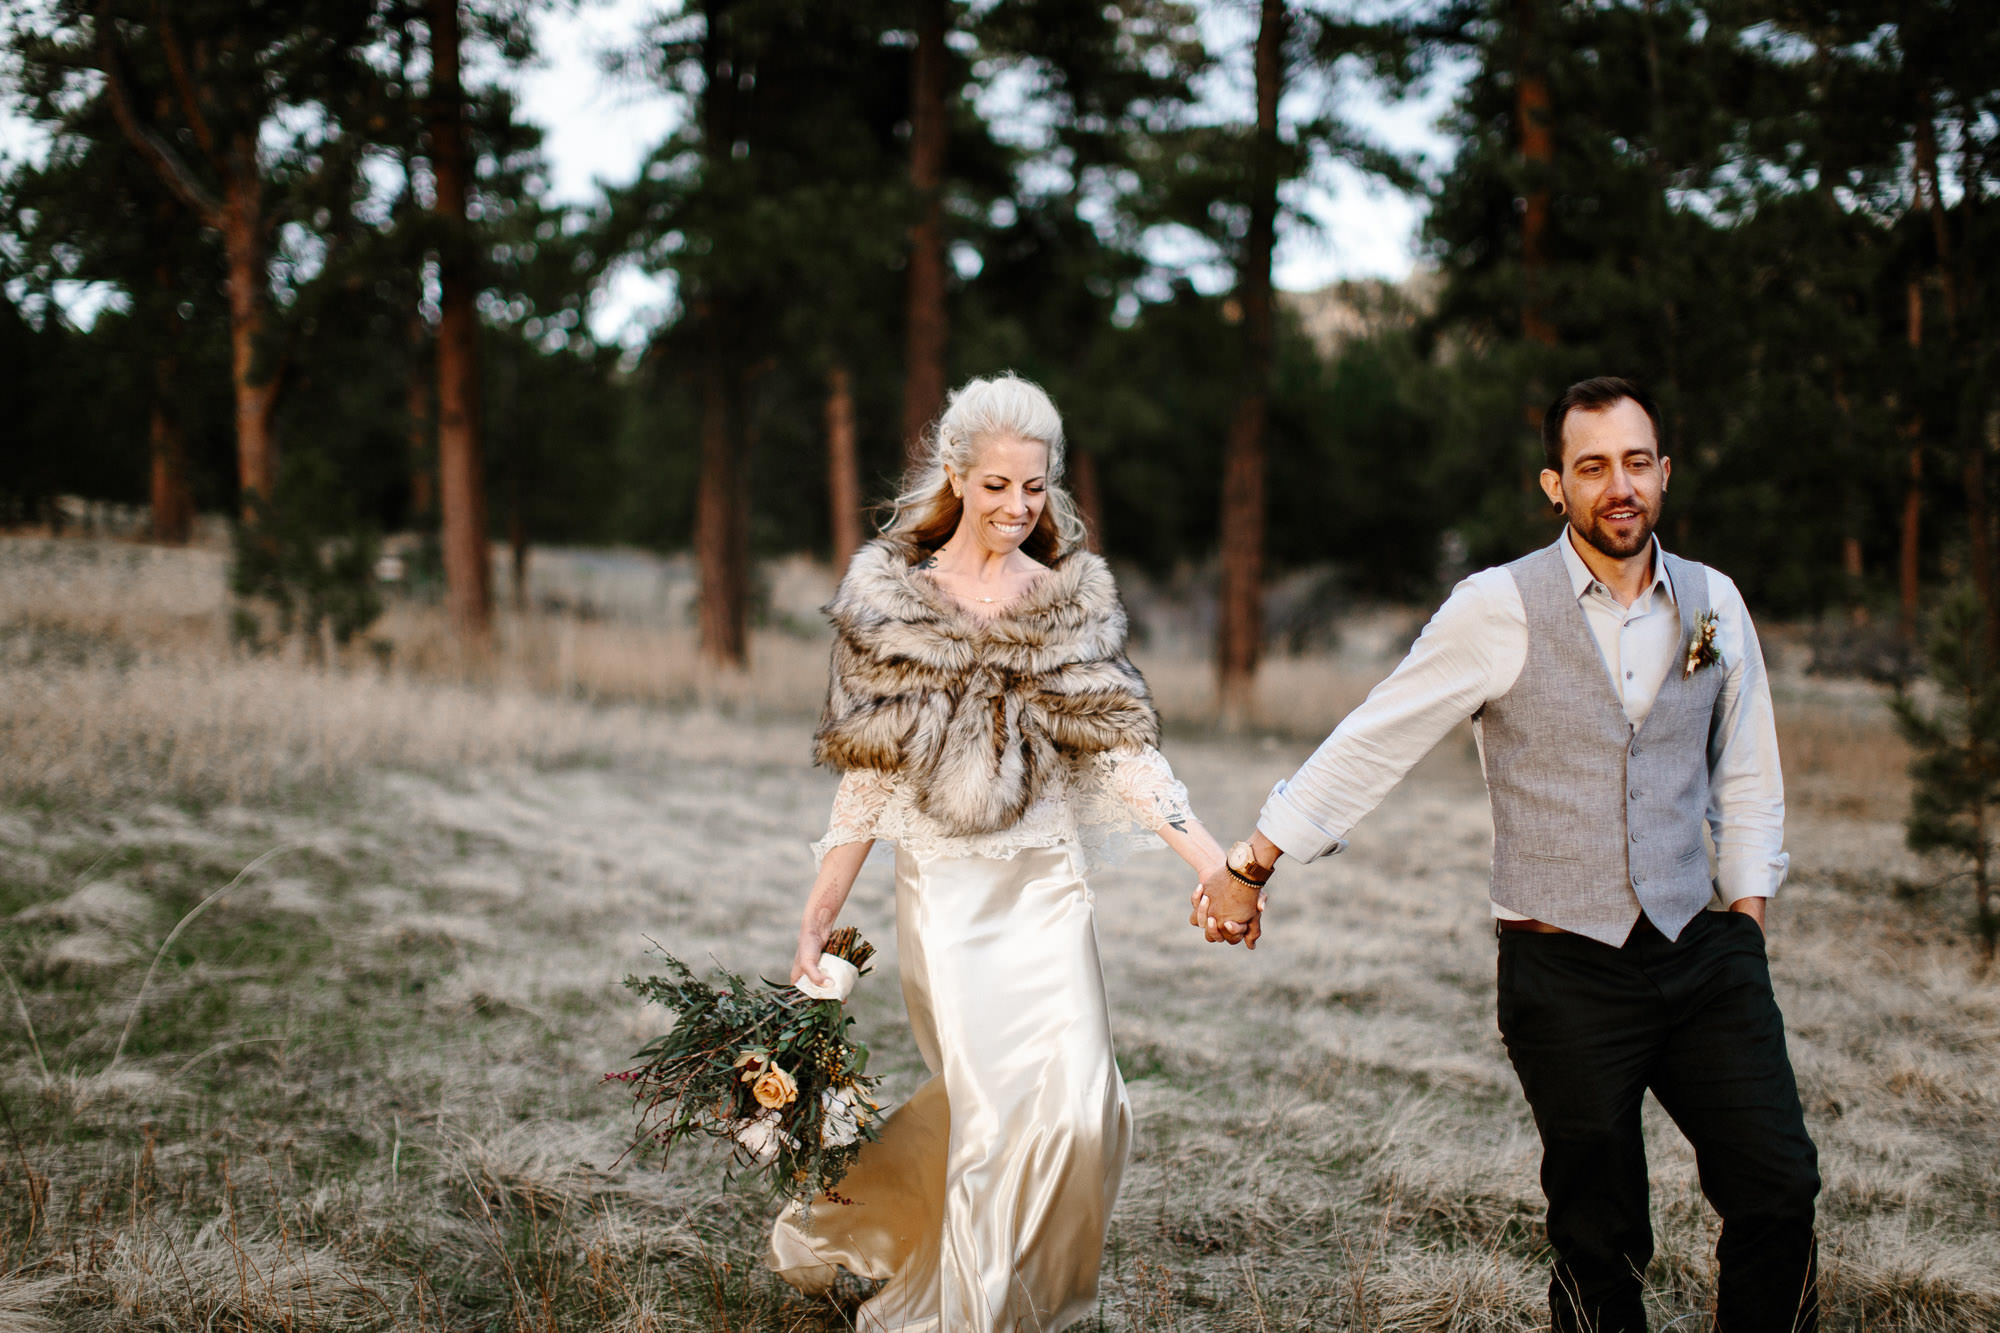 bucci-barn-wedding-elopement-evergreen-boulder-denver-colorado-adventerous-romantic-timeless-098.jpg